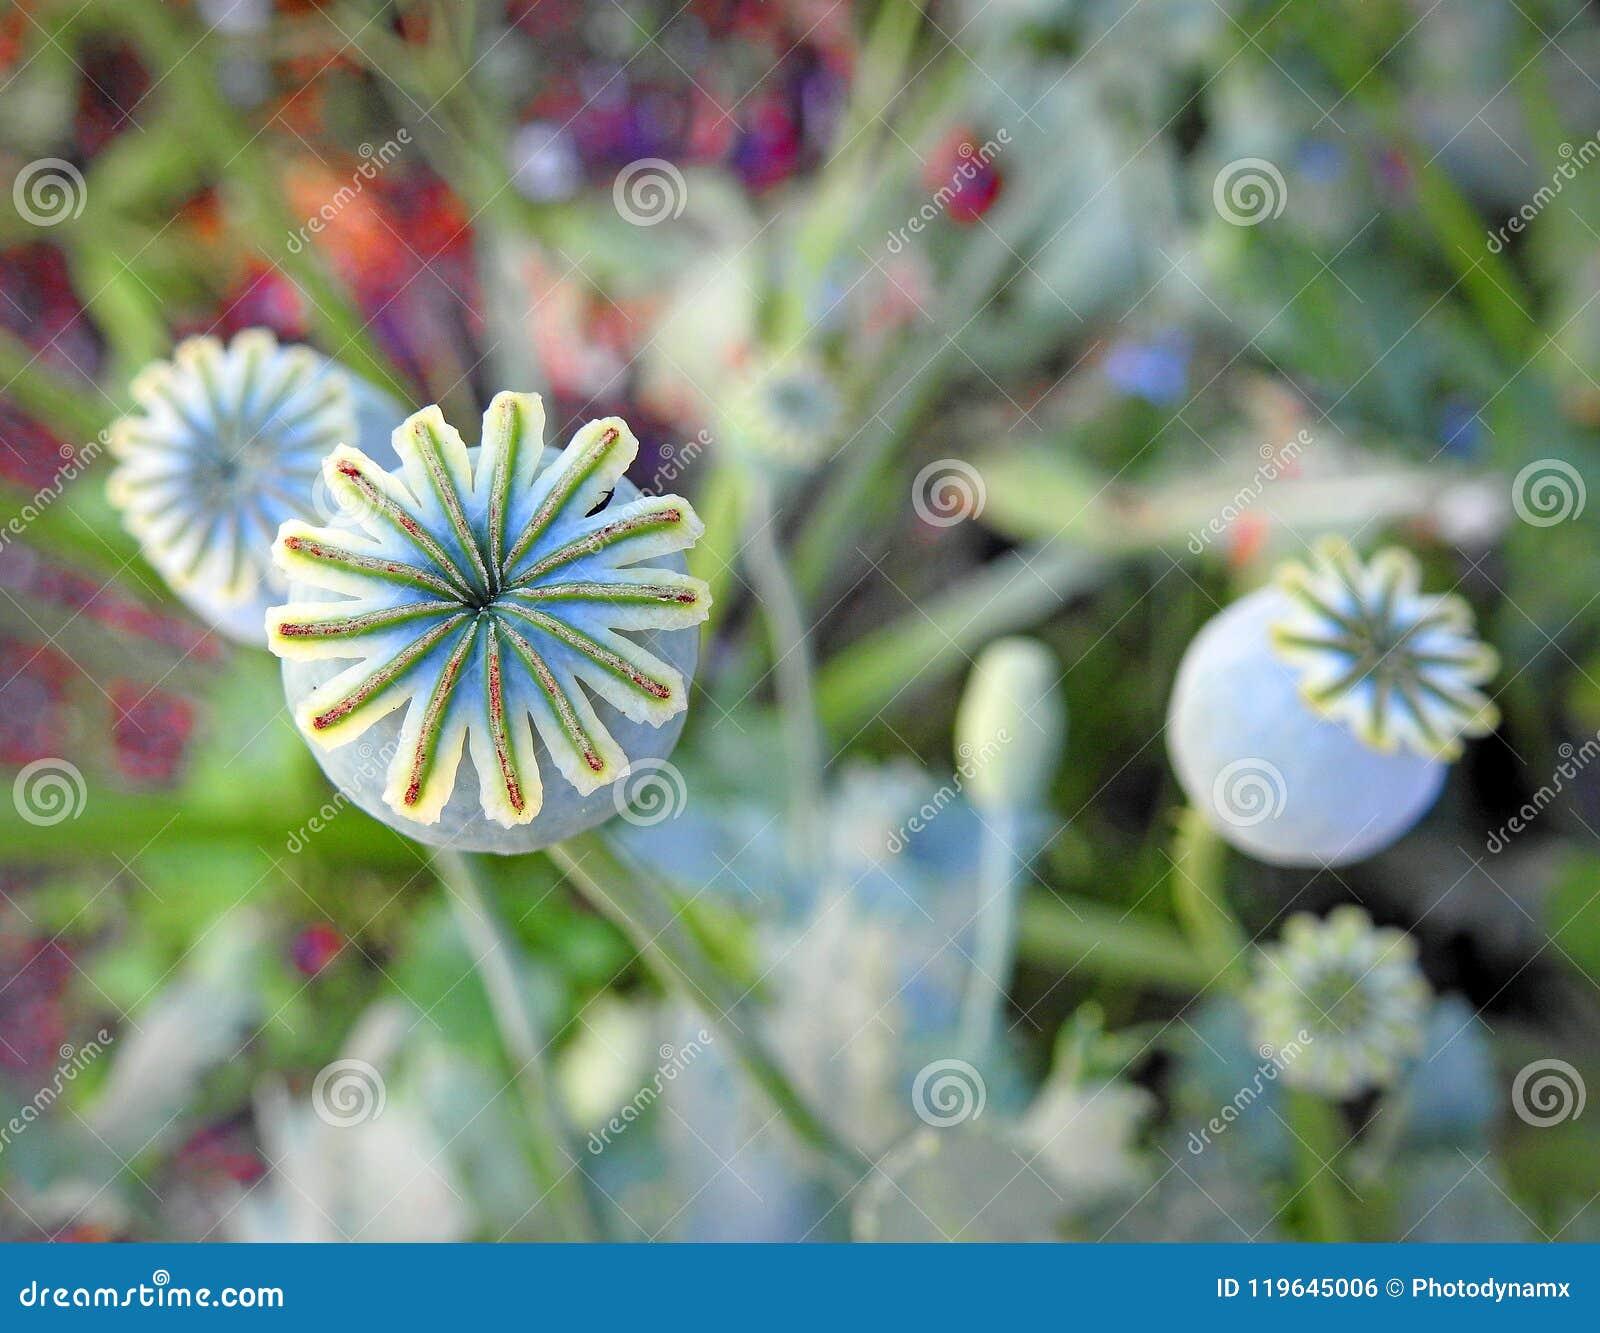 Poppy Seed Pod Heads Flowers Plants Stock Photo Image Of Stalks